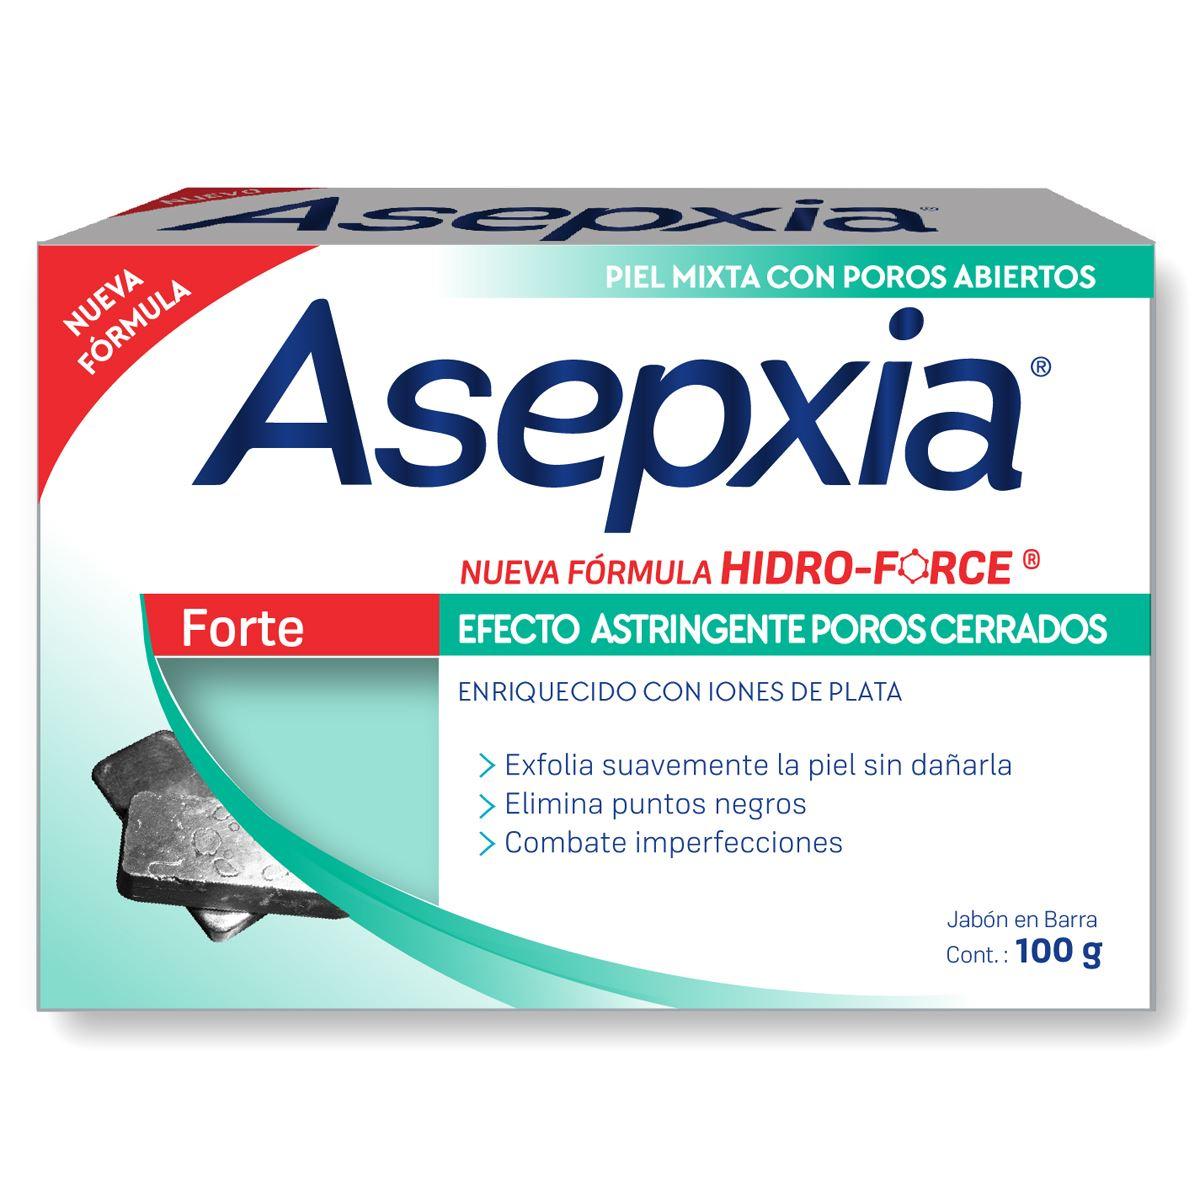 Asepxia jabón forte 100 gr  - Sanborns